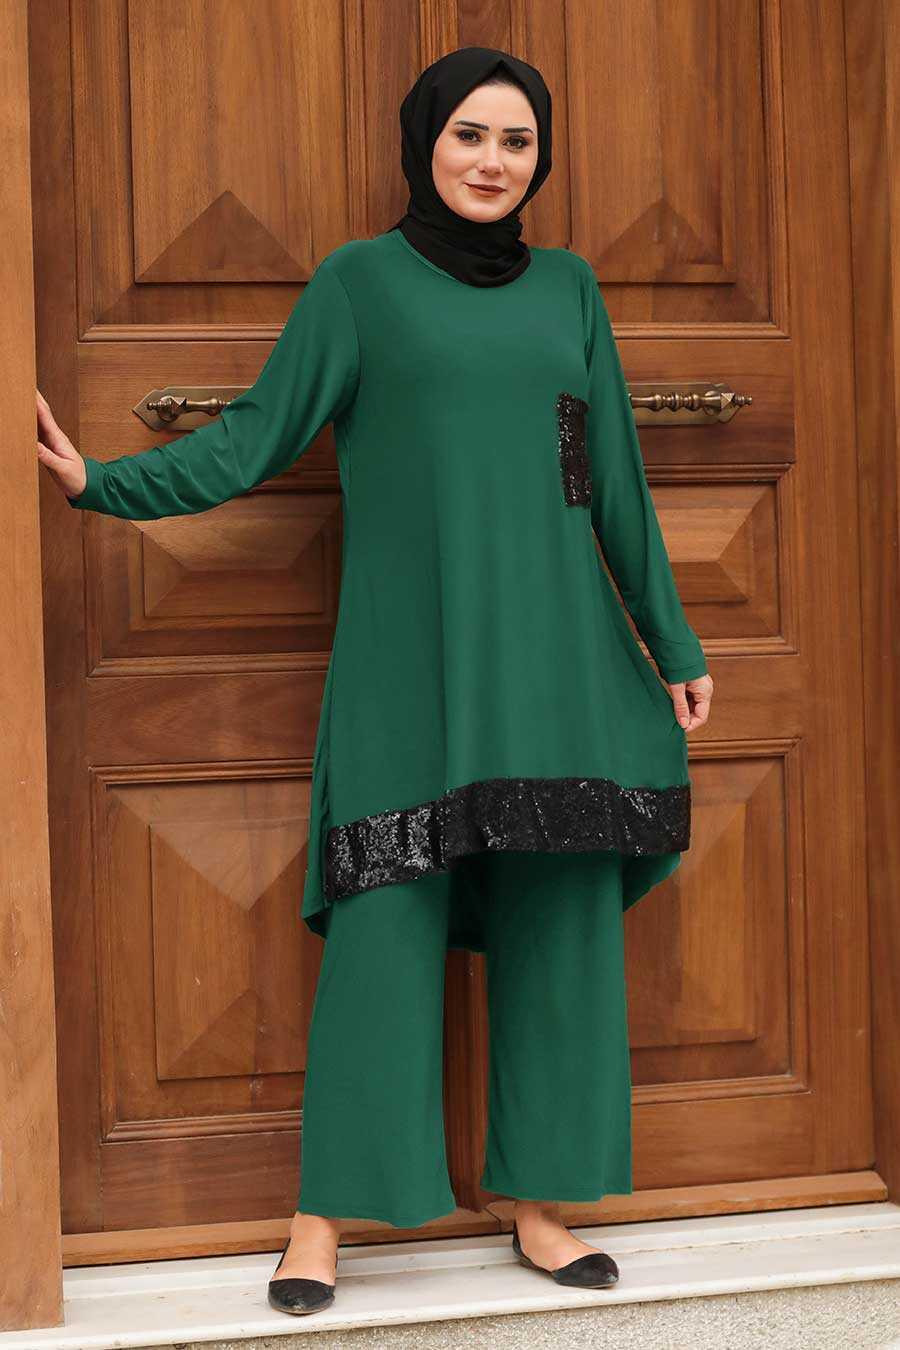 Green Hijab Suit Dress 1946Y